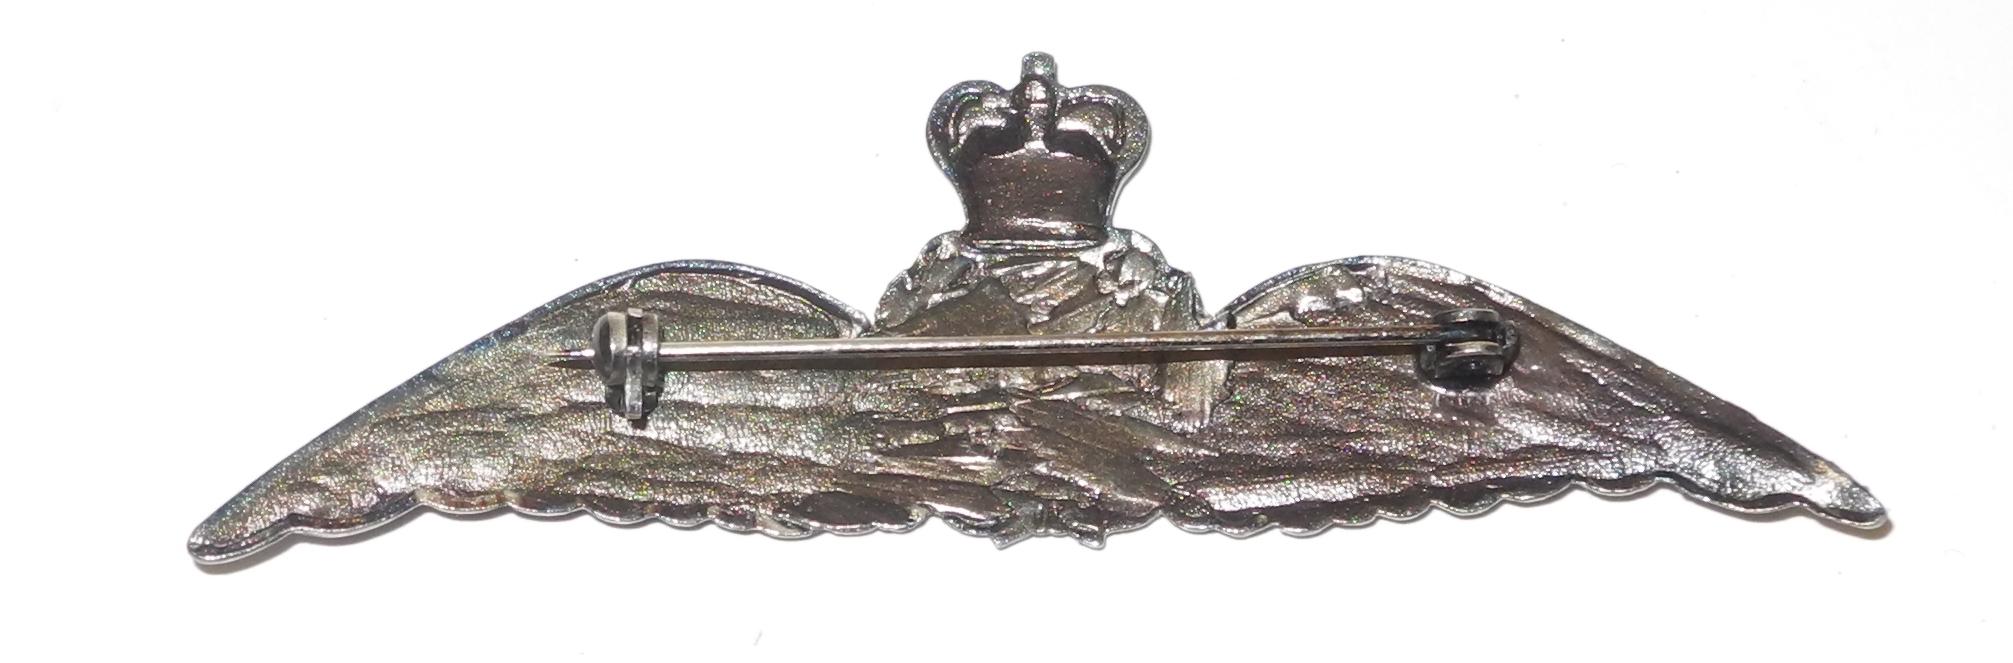 Early post-war RAAF pilot wing badge